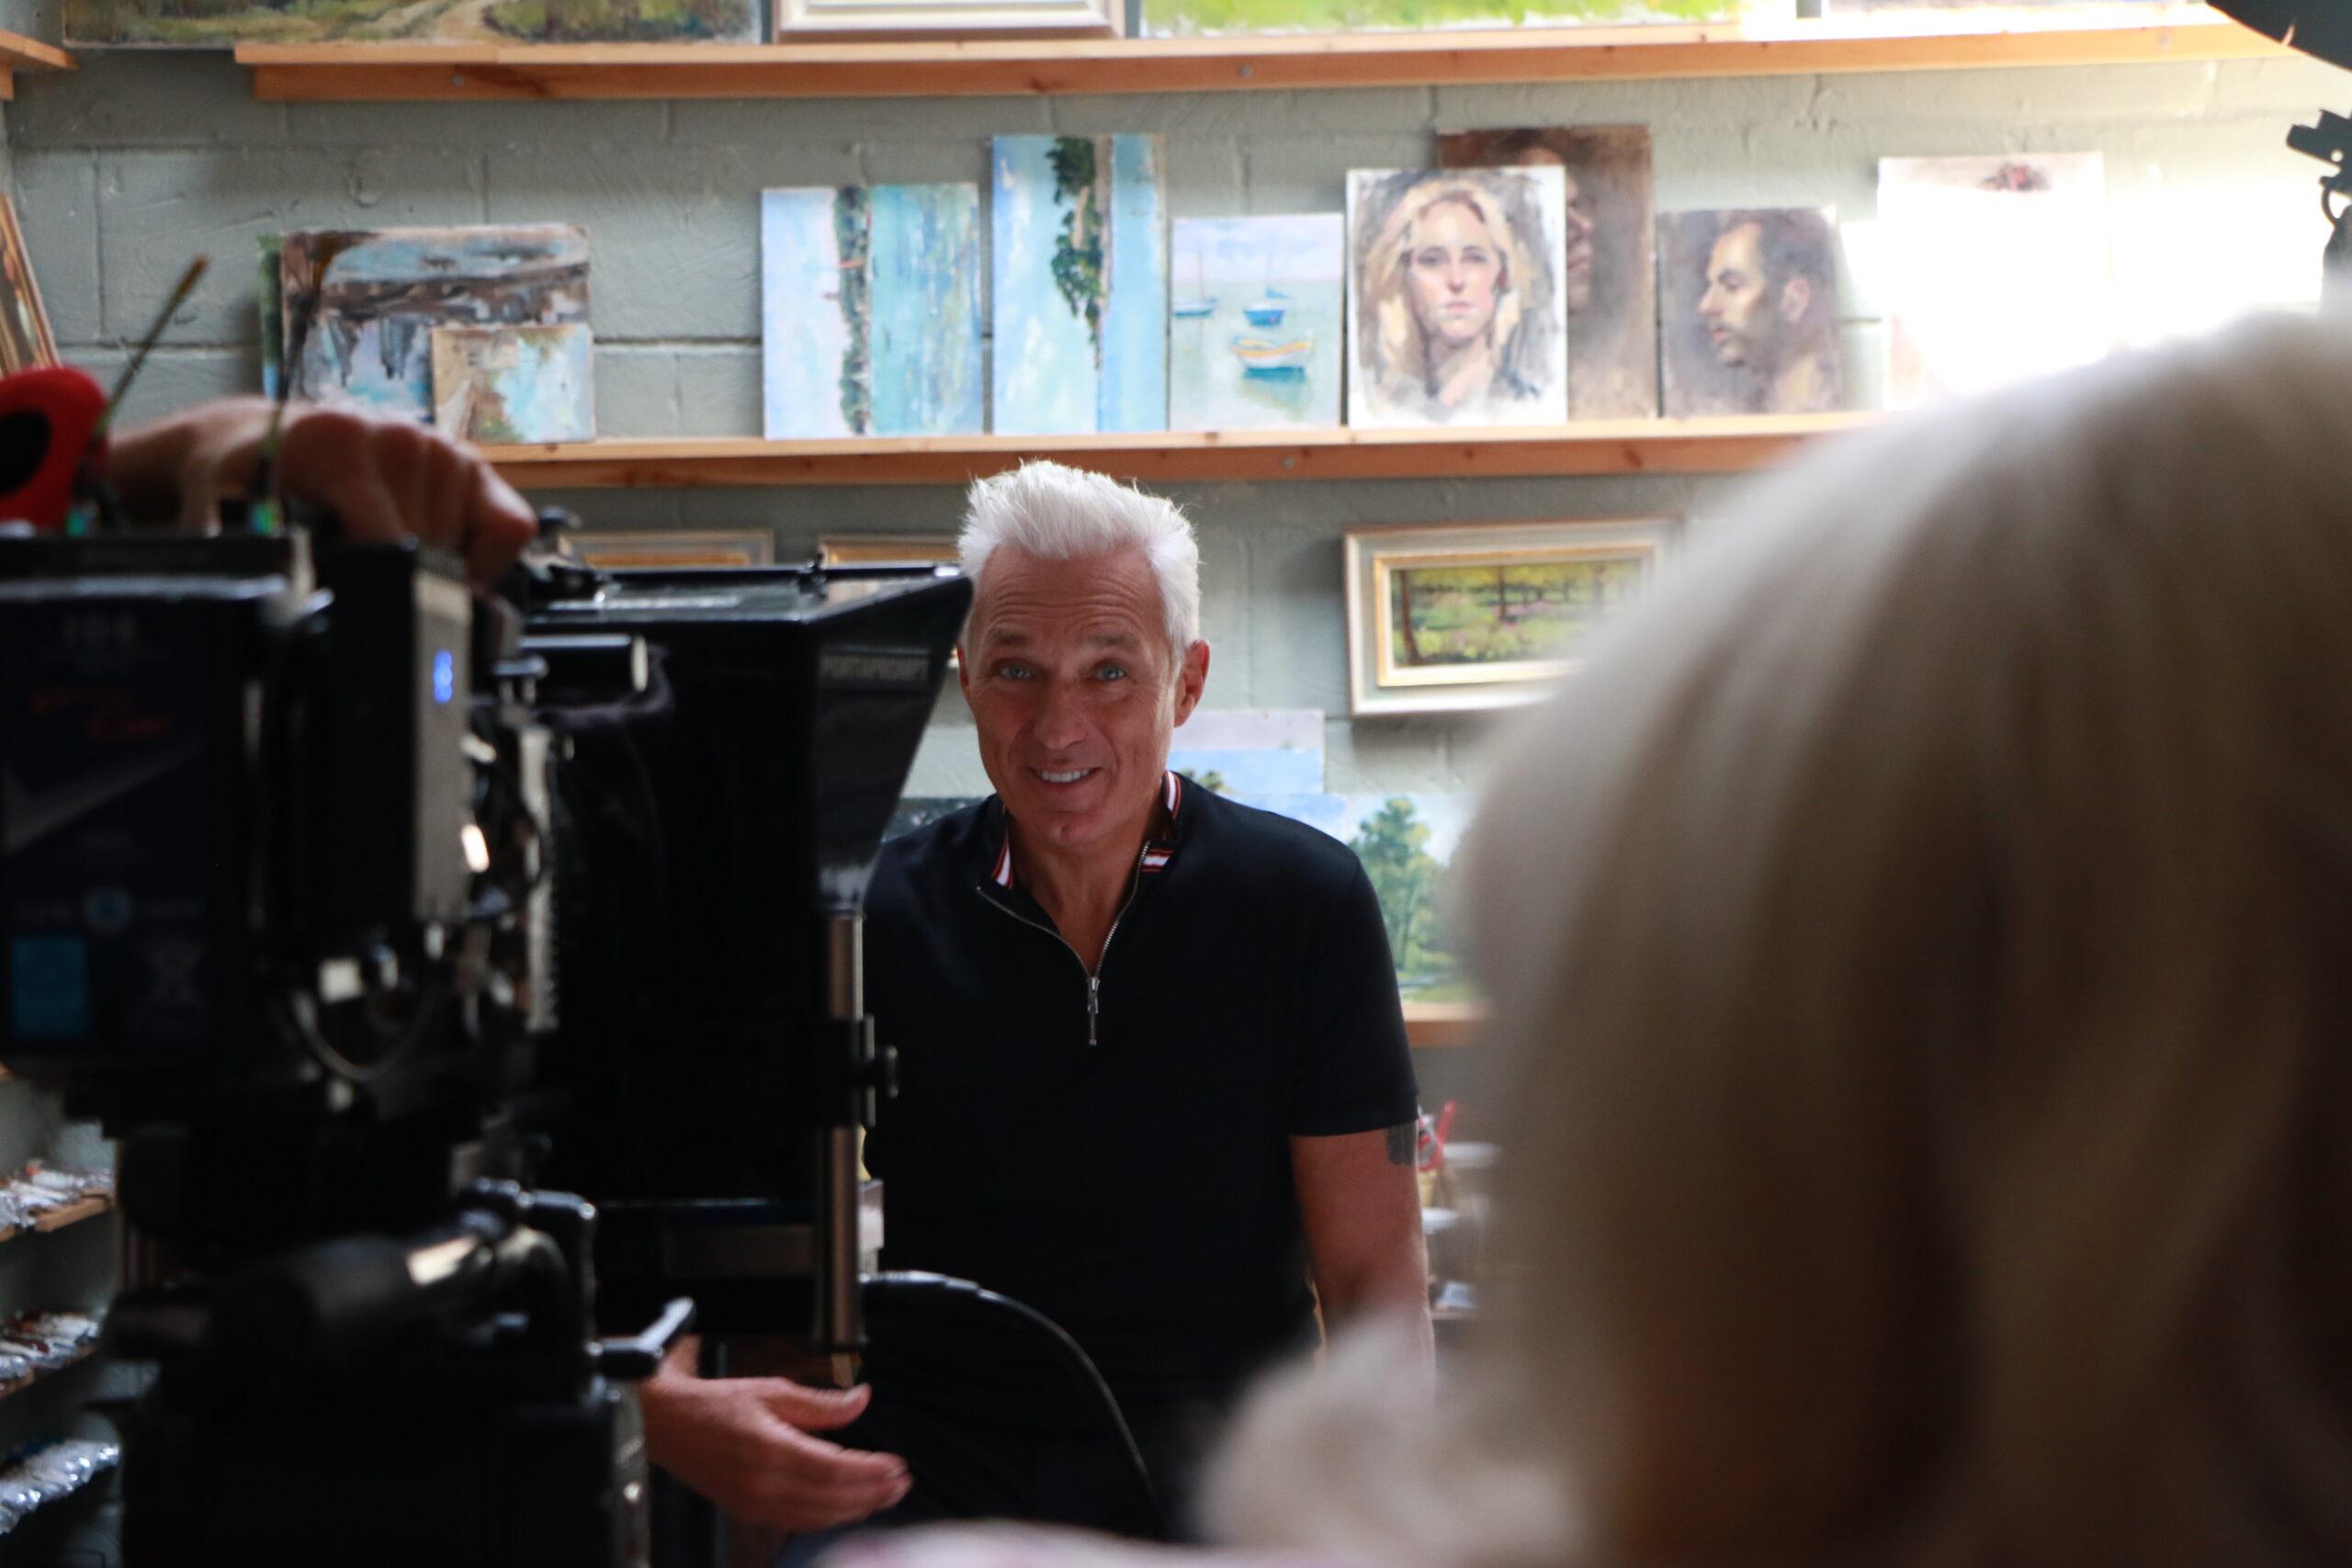 Martin Kemp being filmed in art studio, looking into the camera.